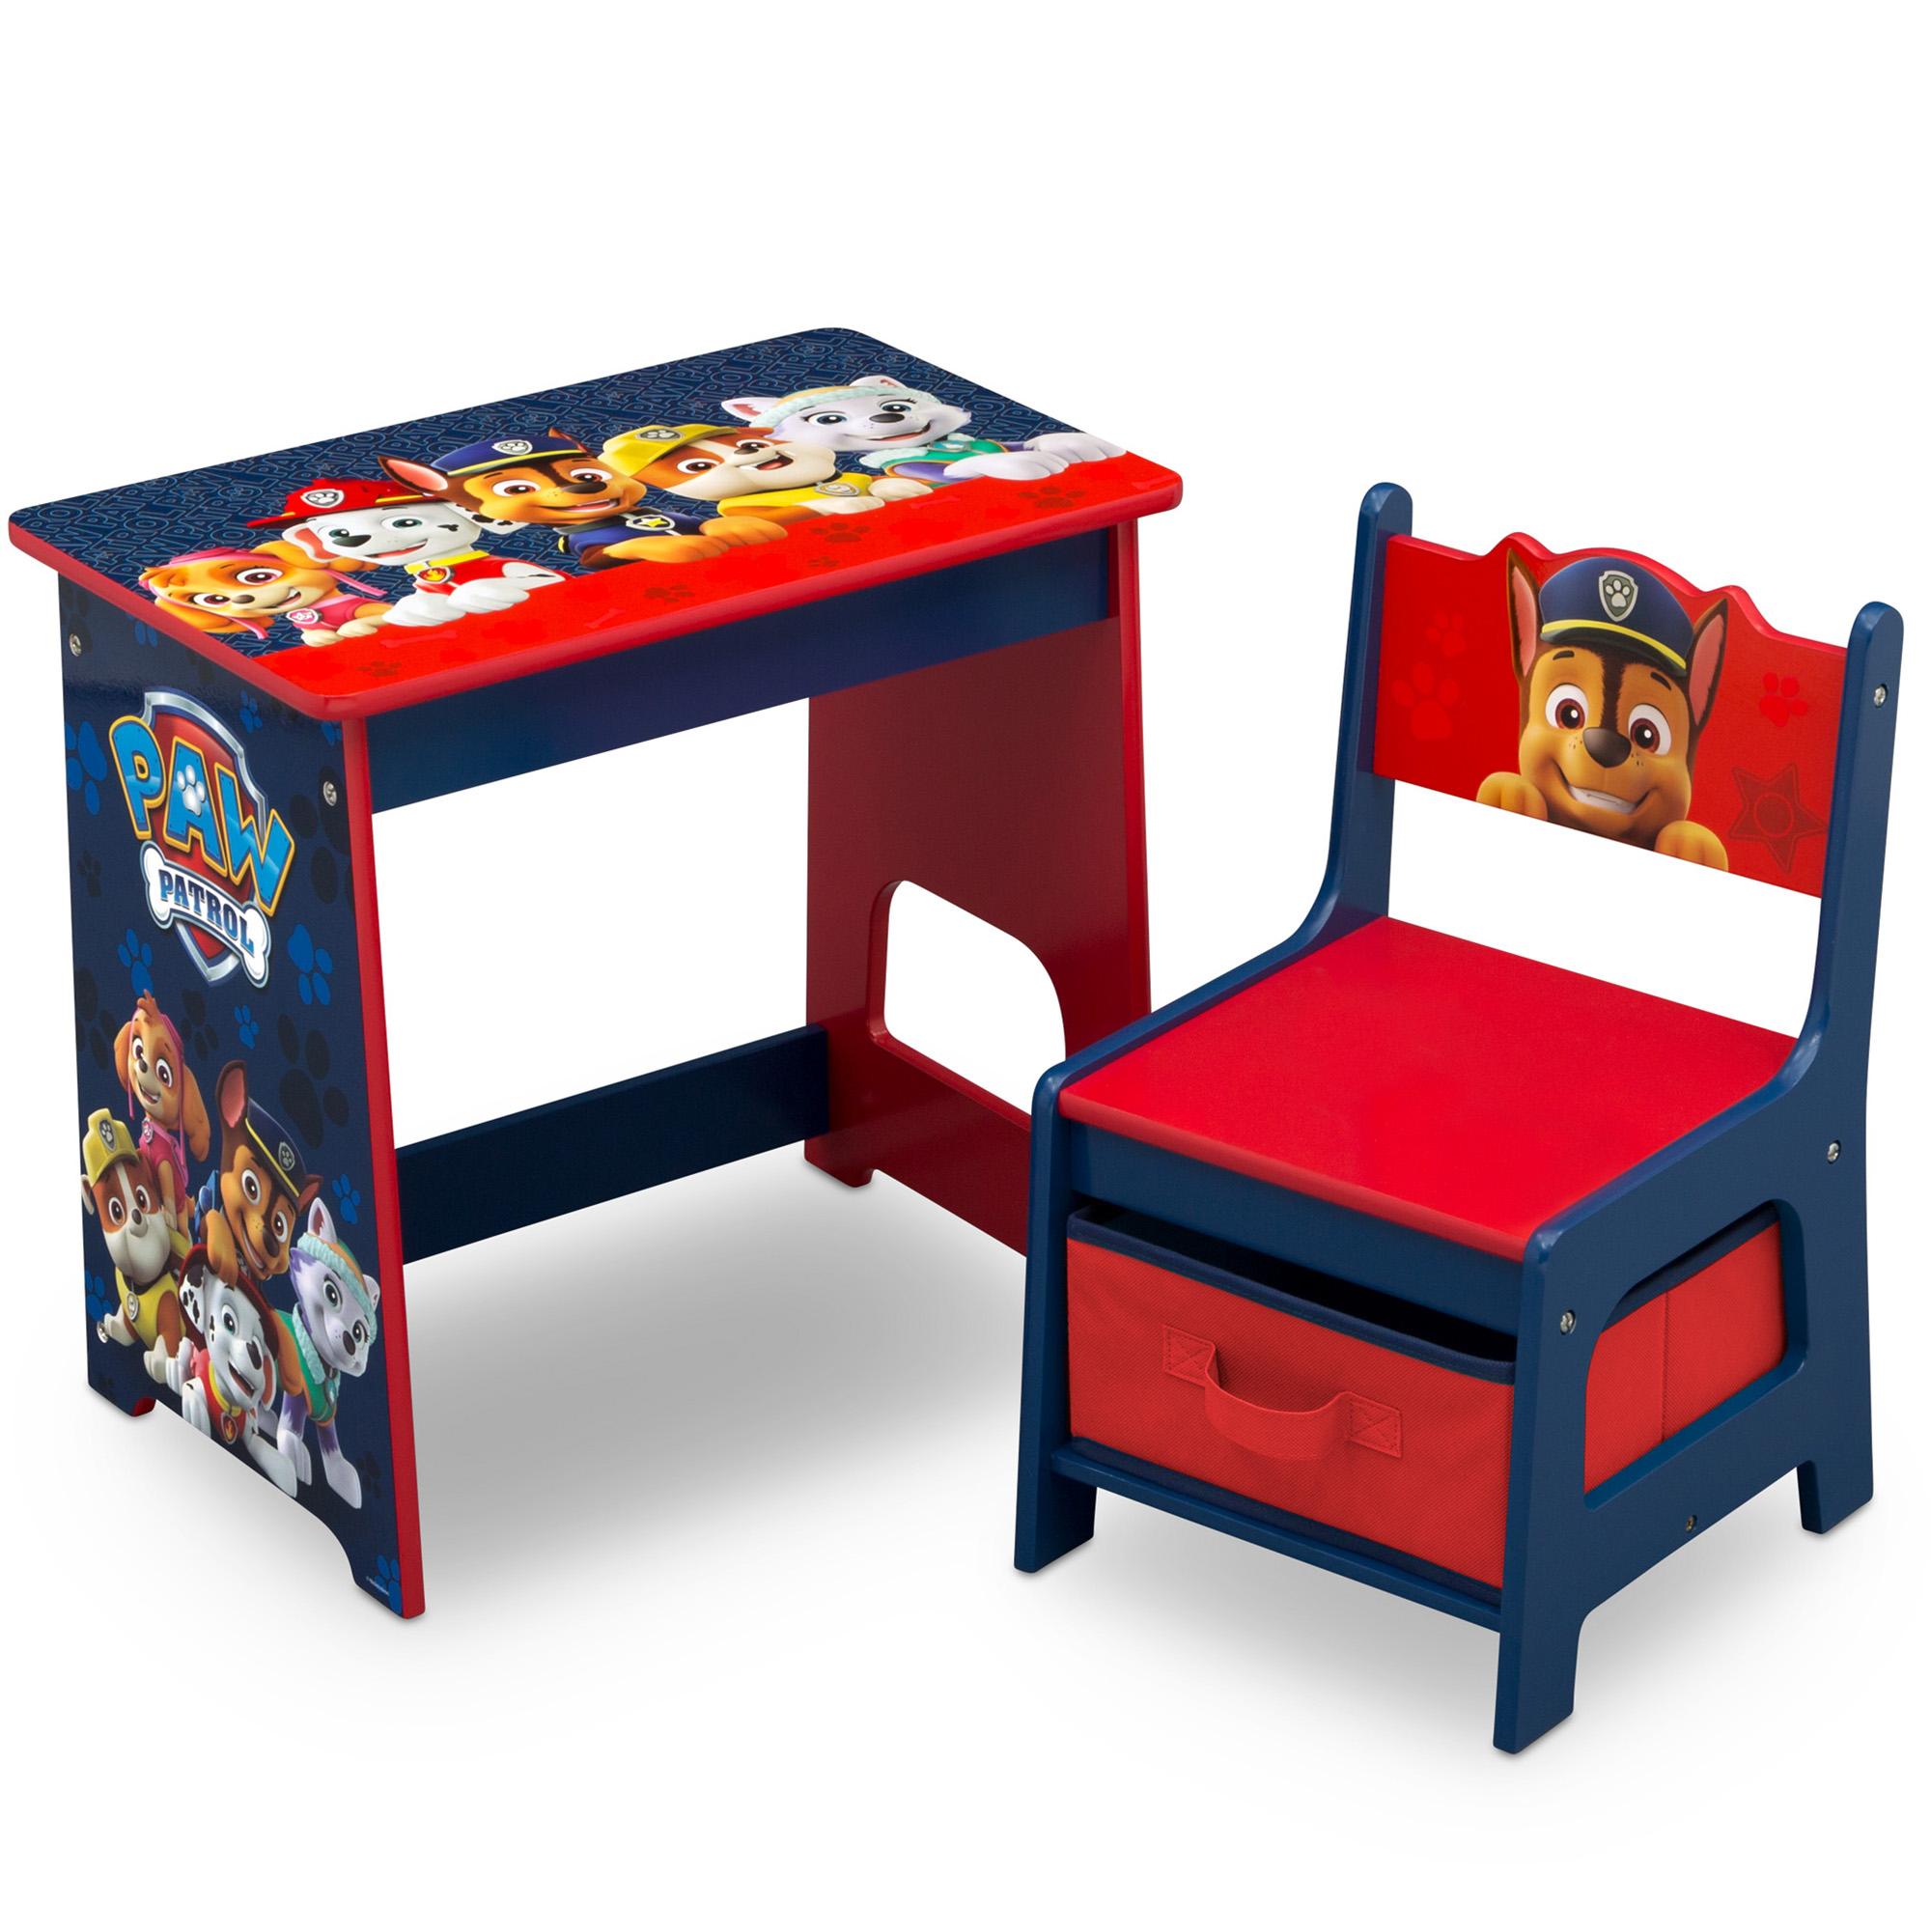 Nick Jr. PAW Patrol Kids Wood Desk and Chair Set by Delta Children